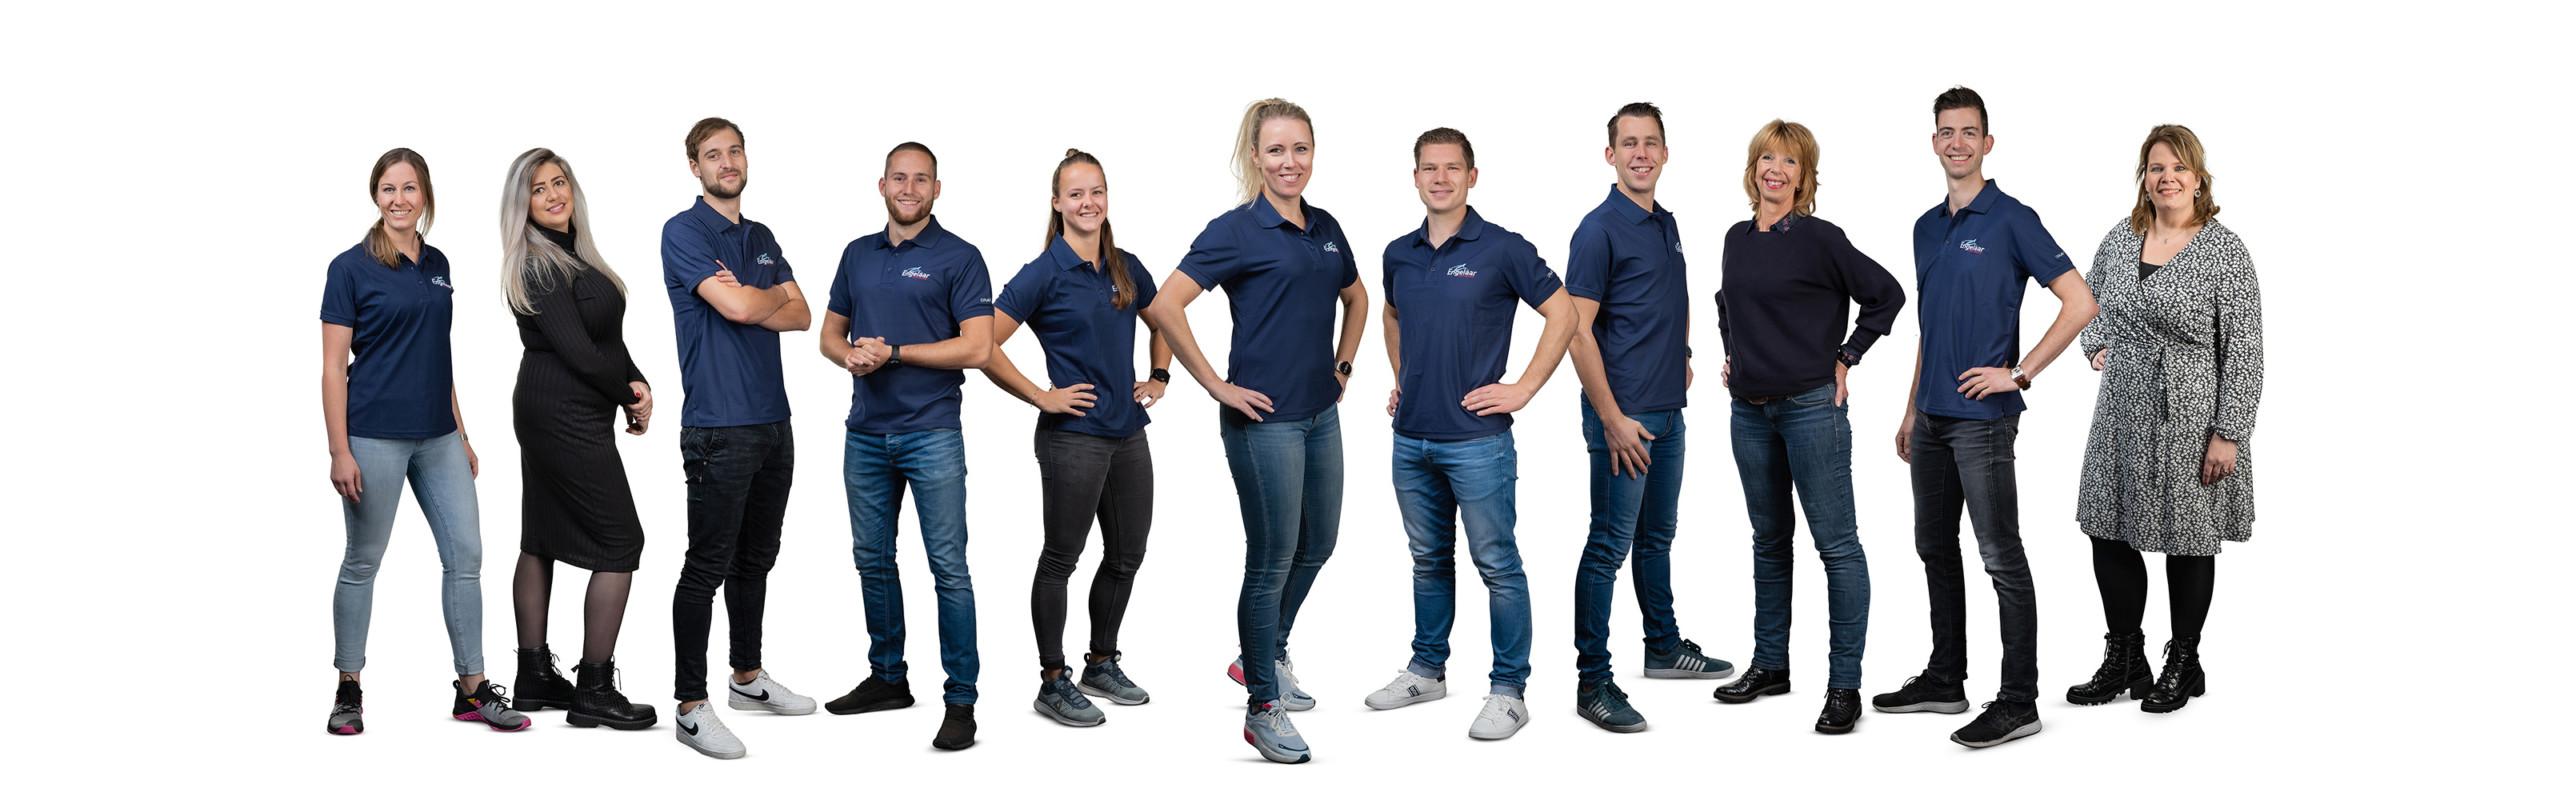 Fysio Engelaar Doetinchem team